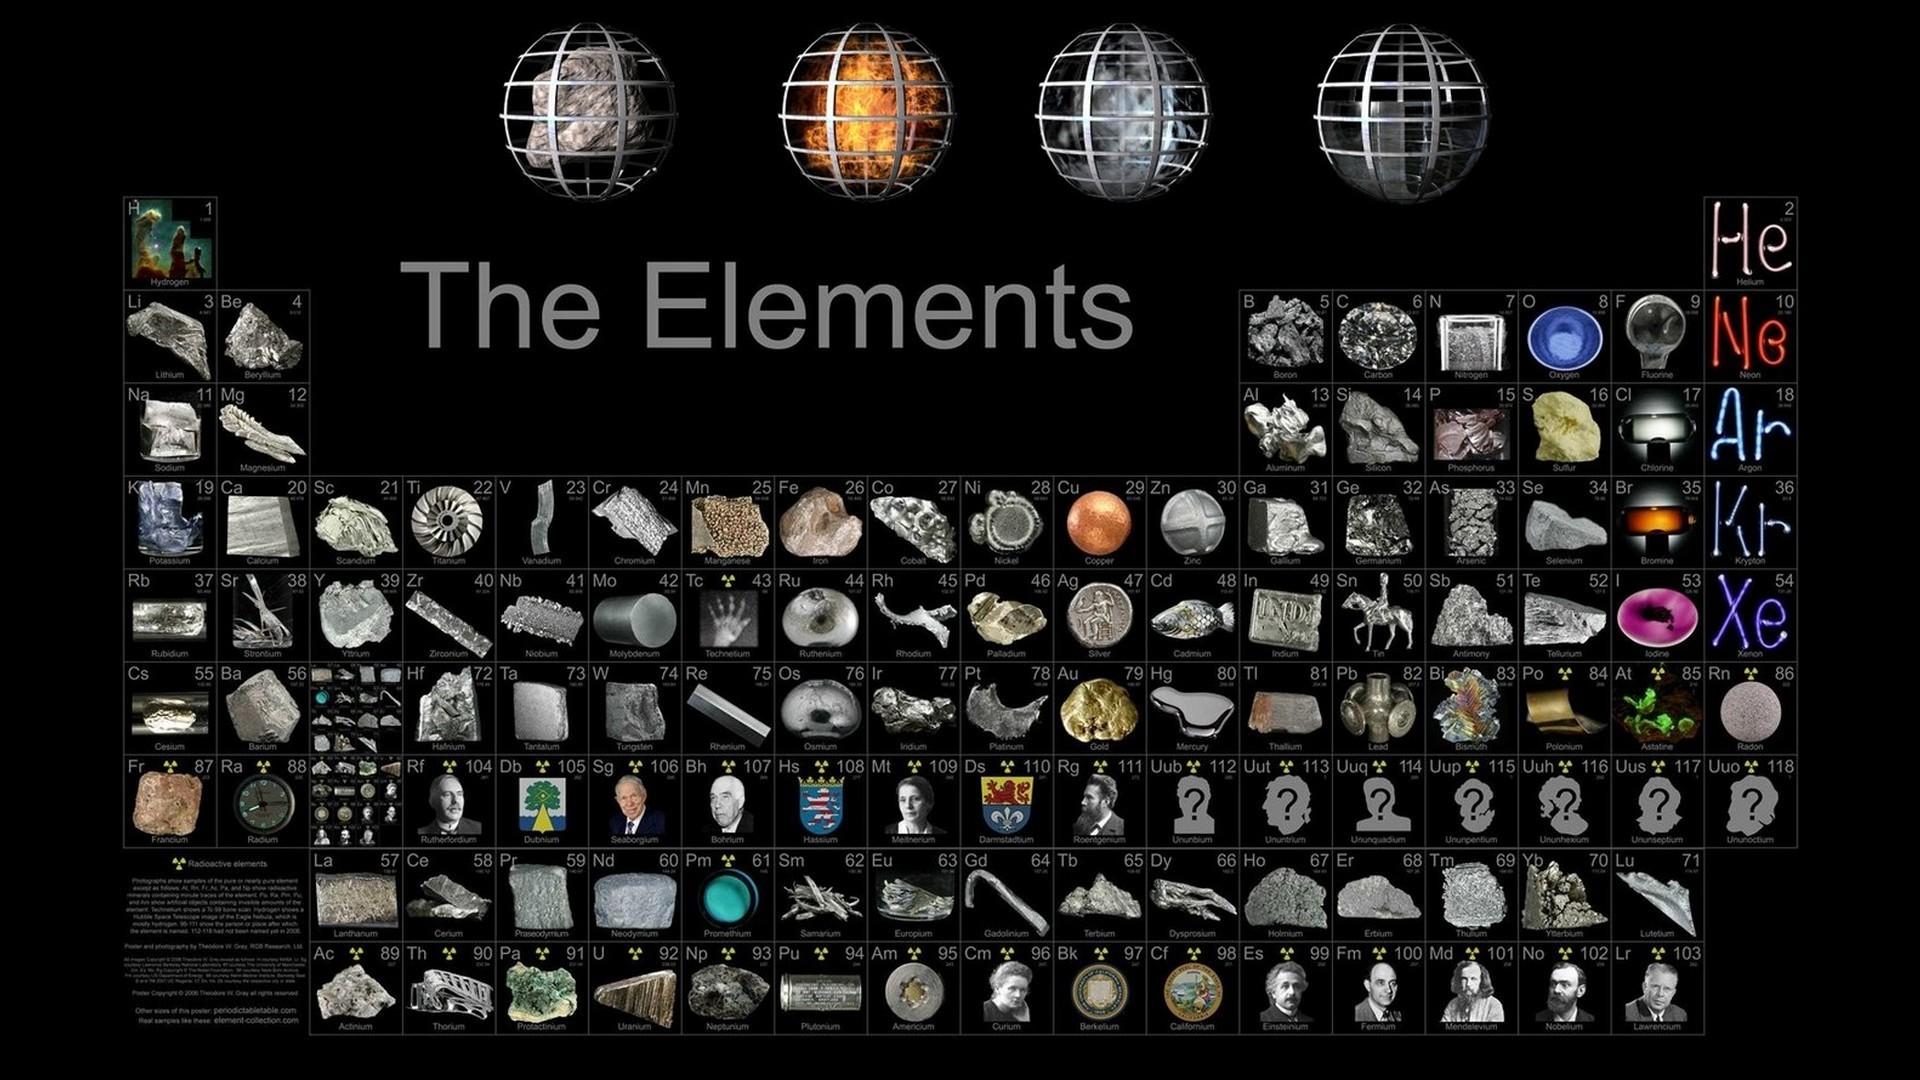 Hd periodic table wallpaper 70 images 1920x1080 aqua neon honeycomb periodic table 2017 edition urtaz Gallery